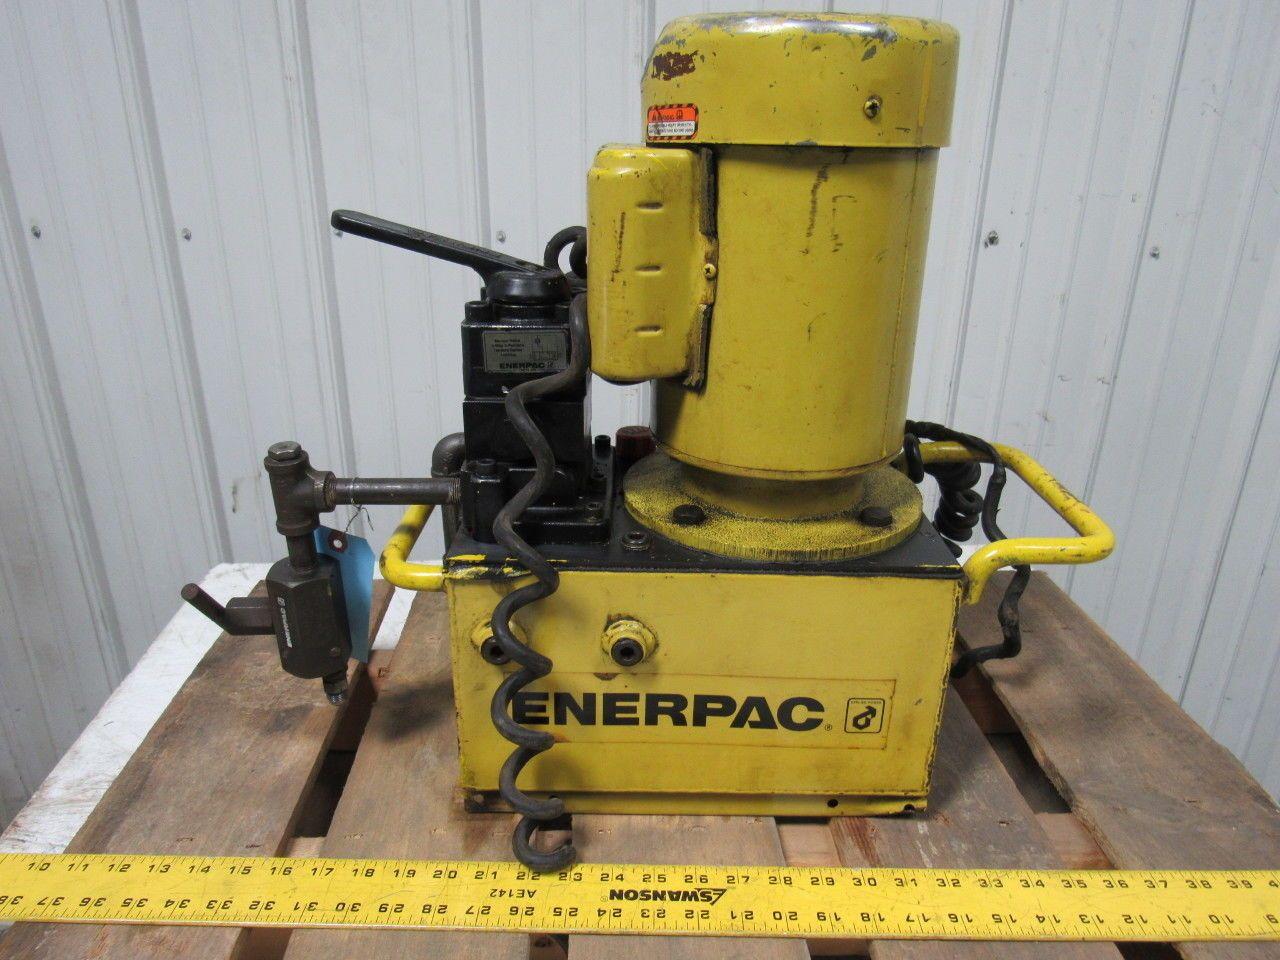 Enerpac Pem3602b 30000 Submerged 10 000psi Max Electric Hydraulic